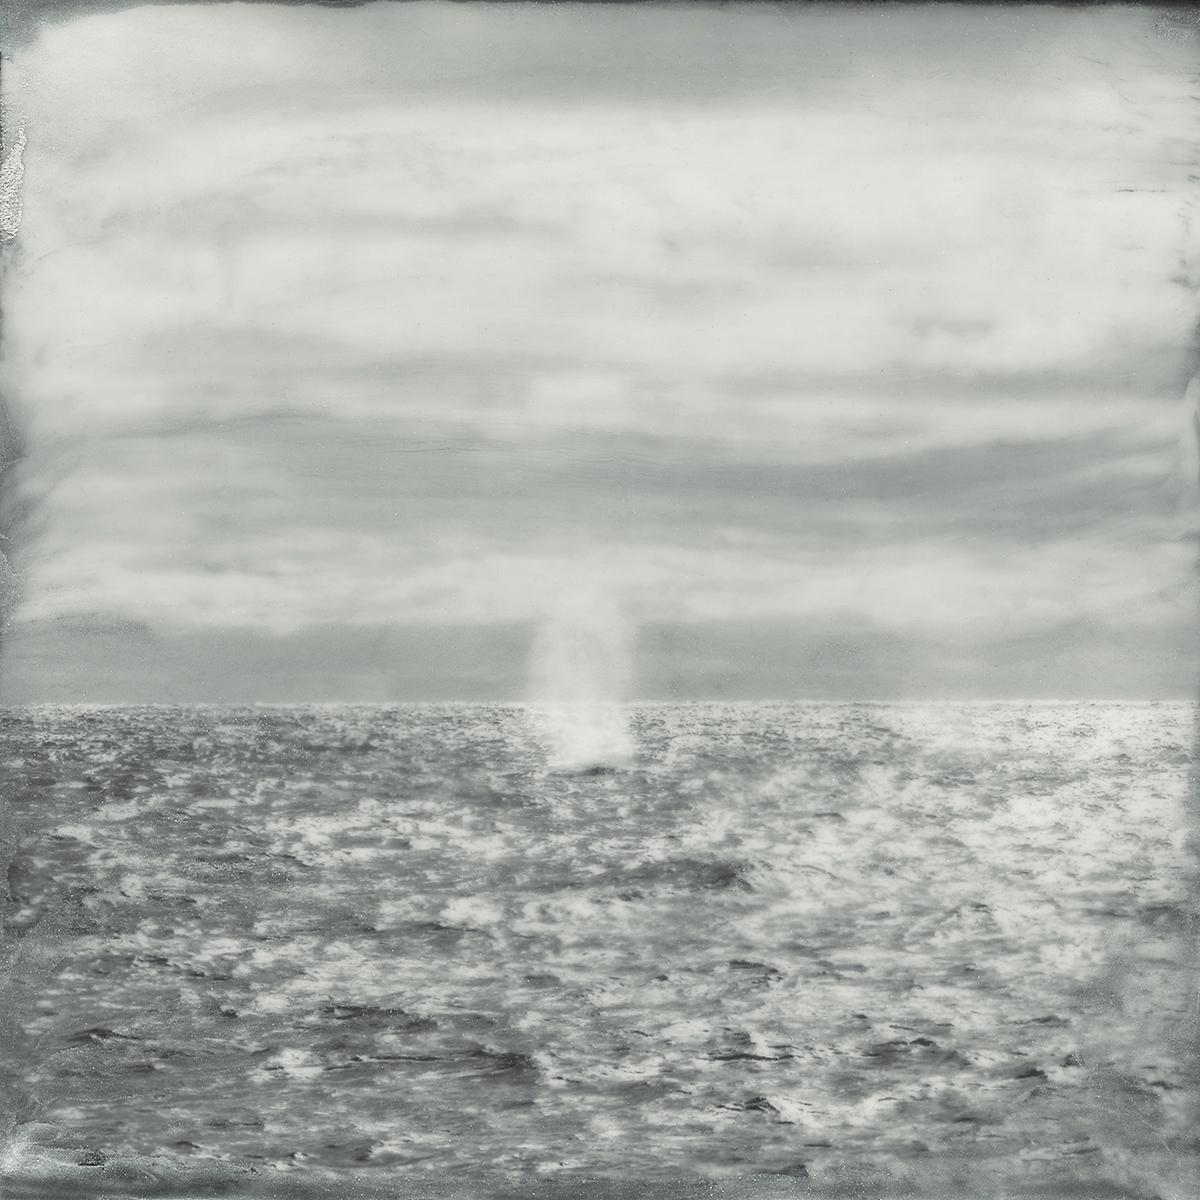 White Whale Spray